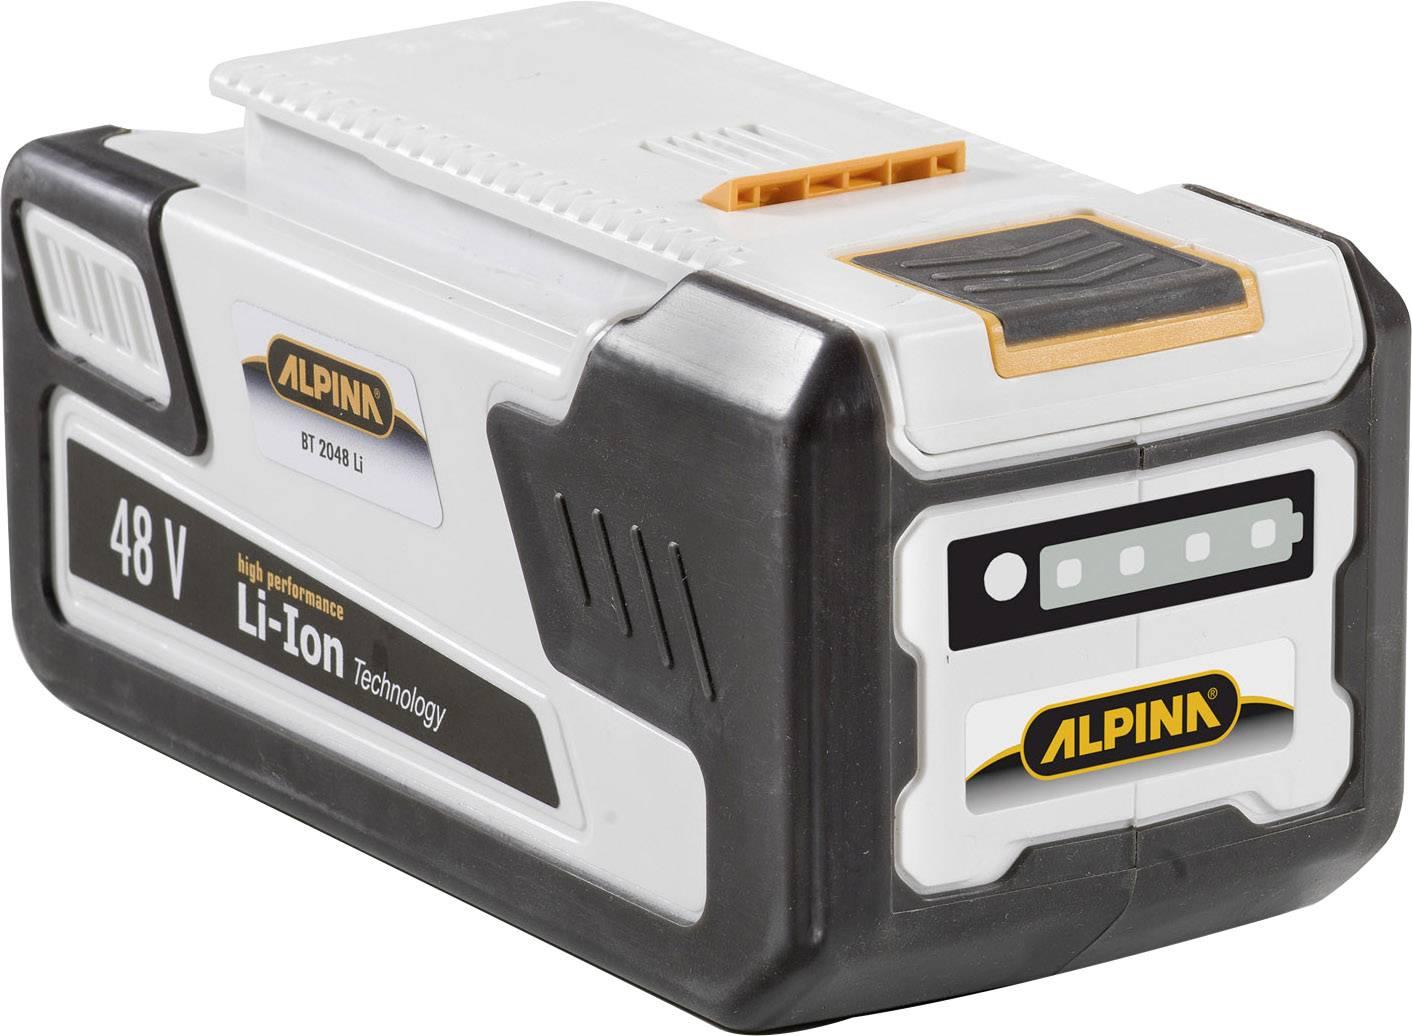 Náhradní akumulátor pro elektrické nářadí, ALPINA BT 2048 270482010/A15, 48 V, 2 Ah, Li-Ion akumulátor